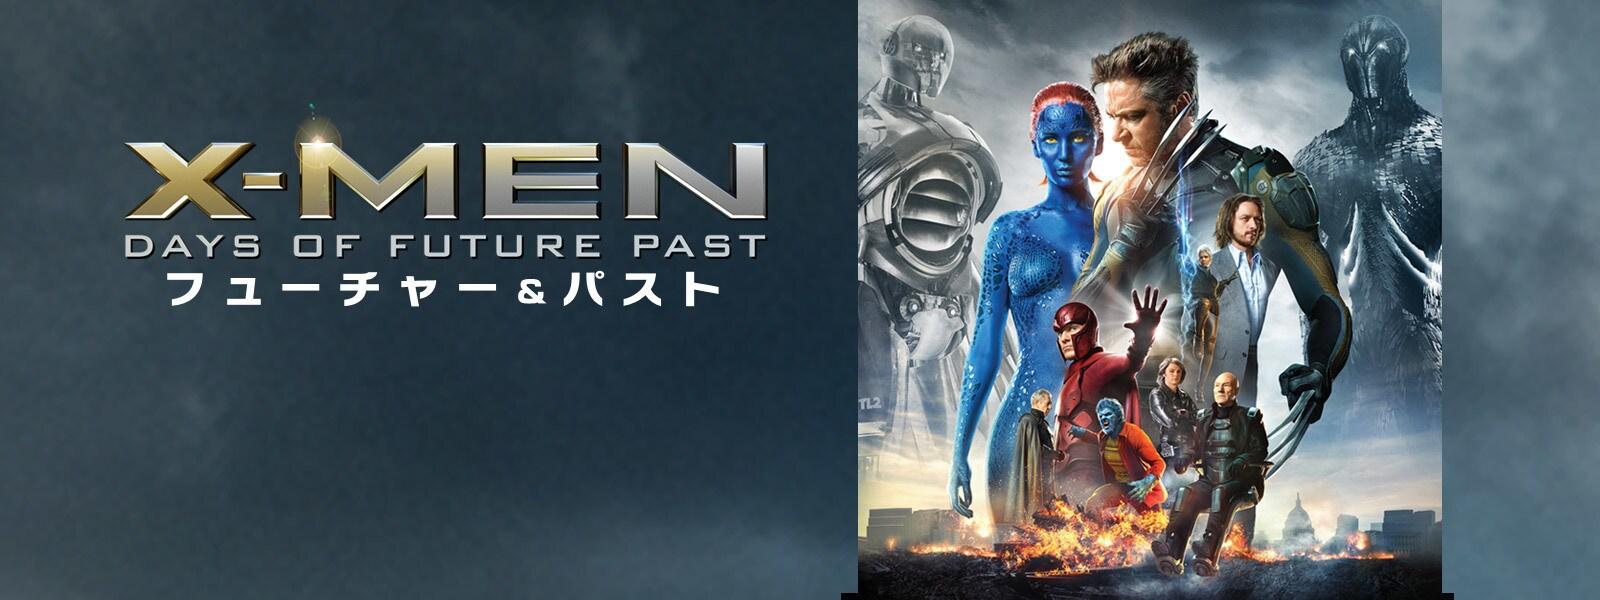 X-MEN:フューチャー&パスト X-Men: Days of Future Past Hero